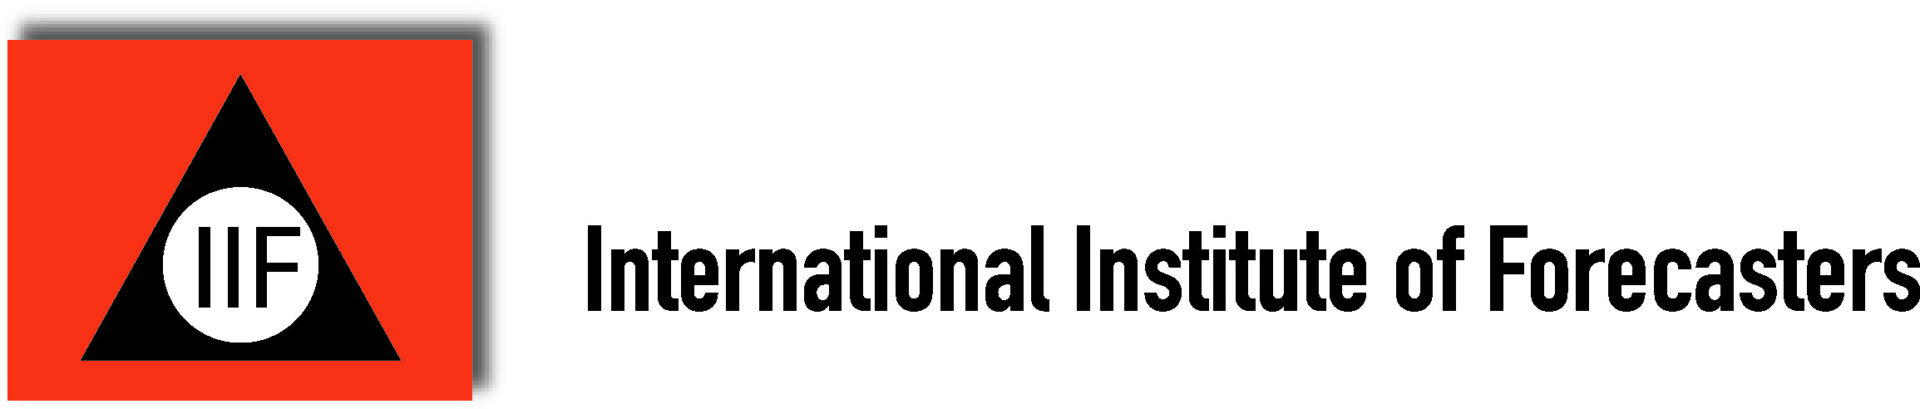 IIF | International Institute of Forecasters